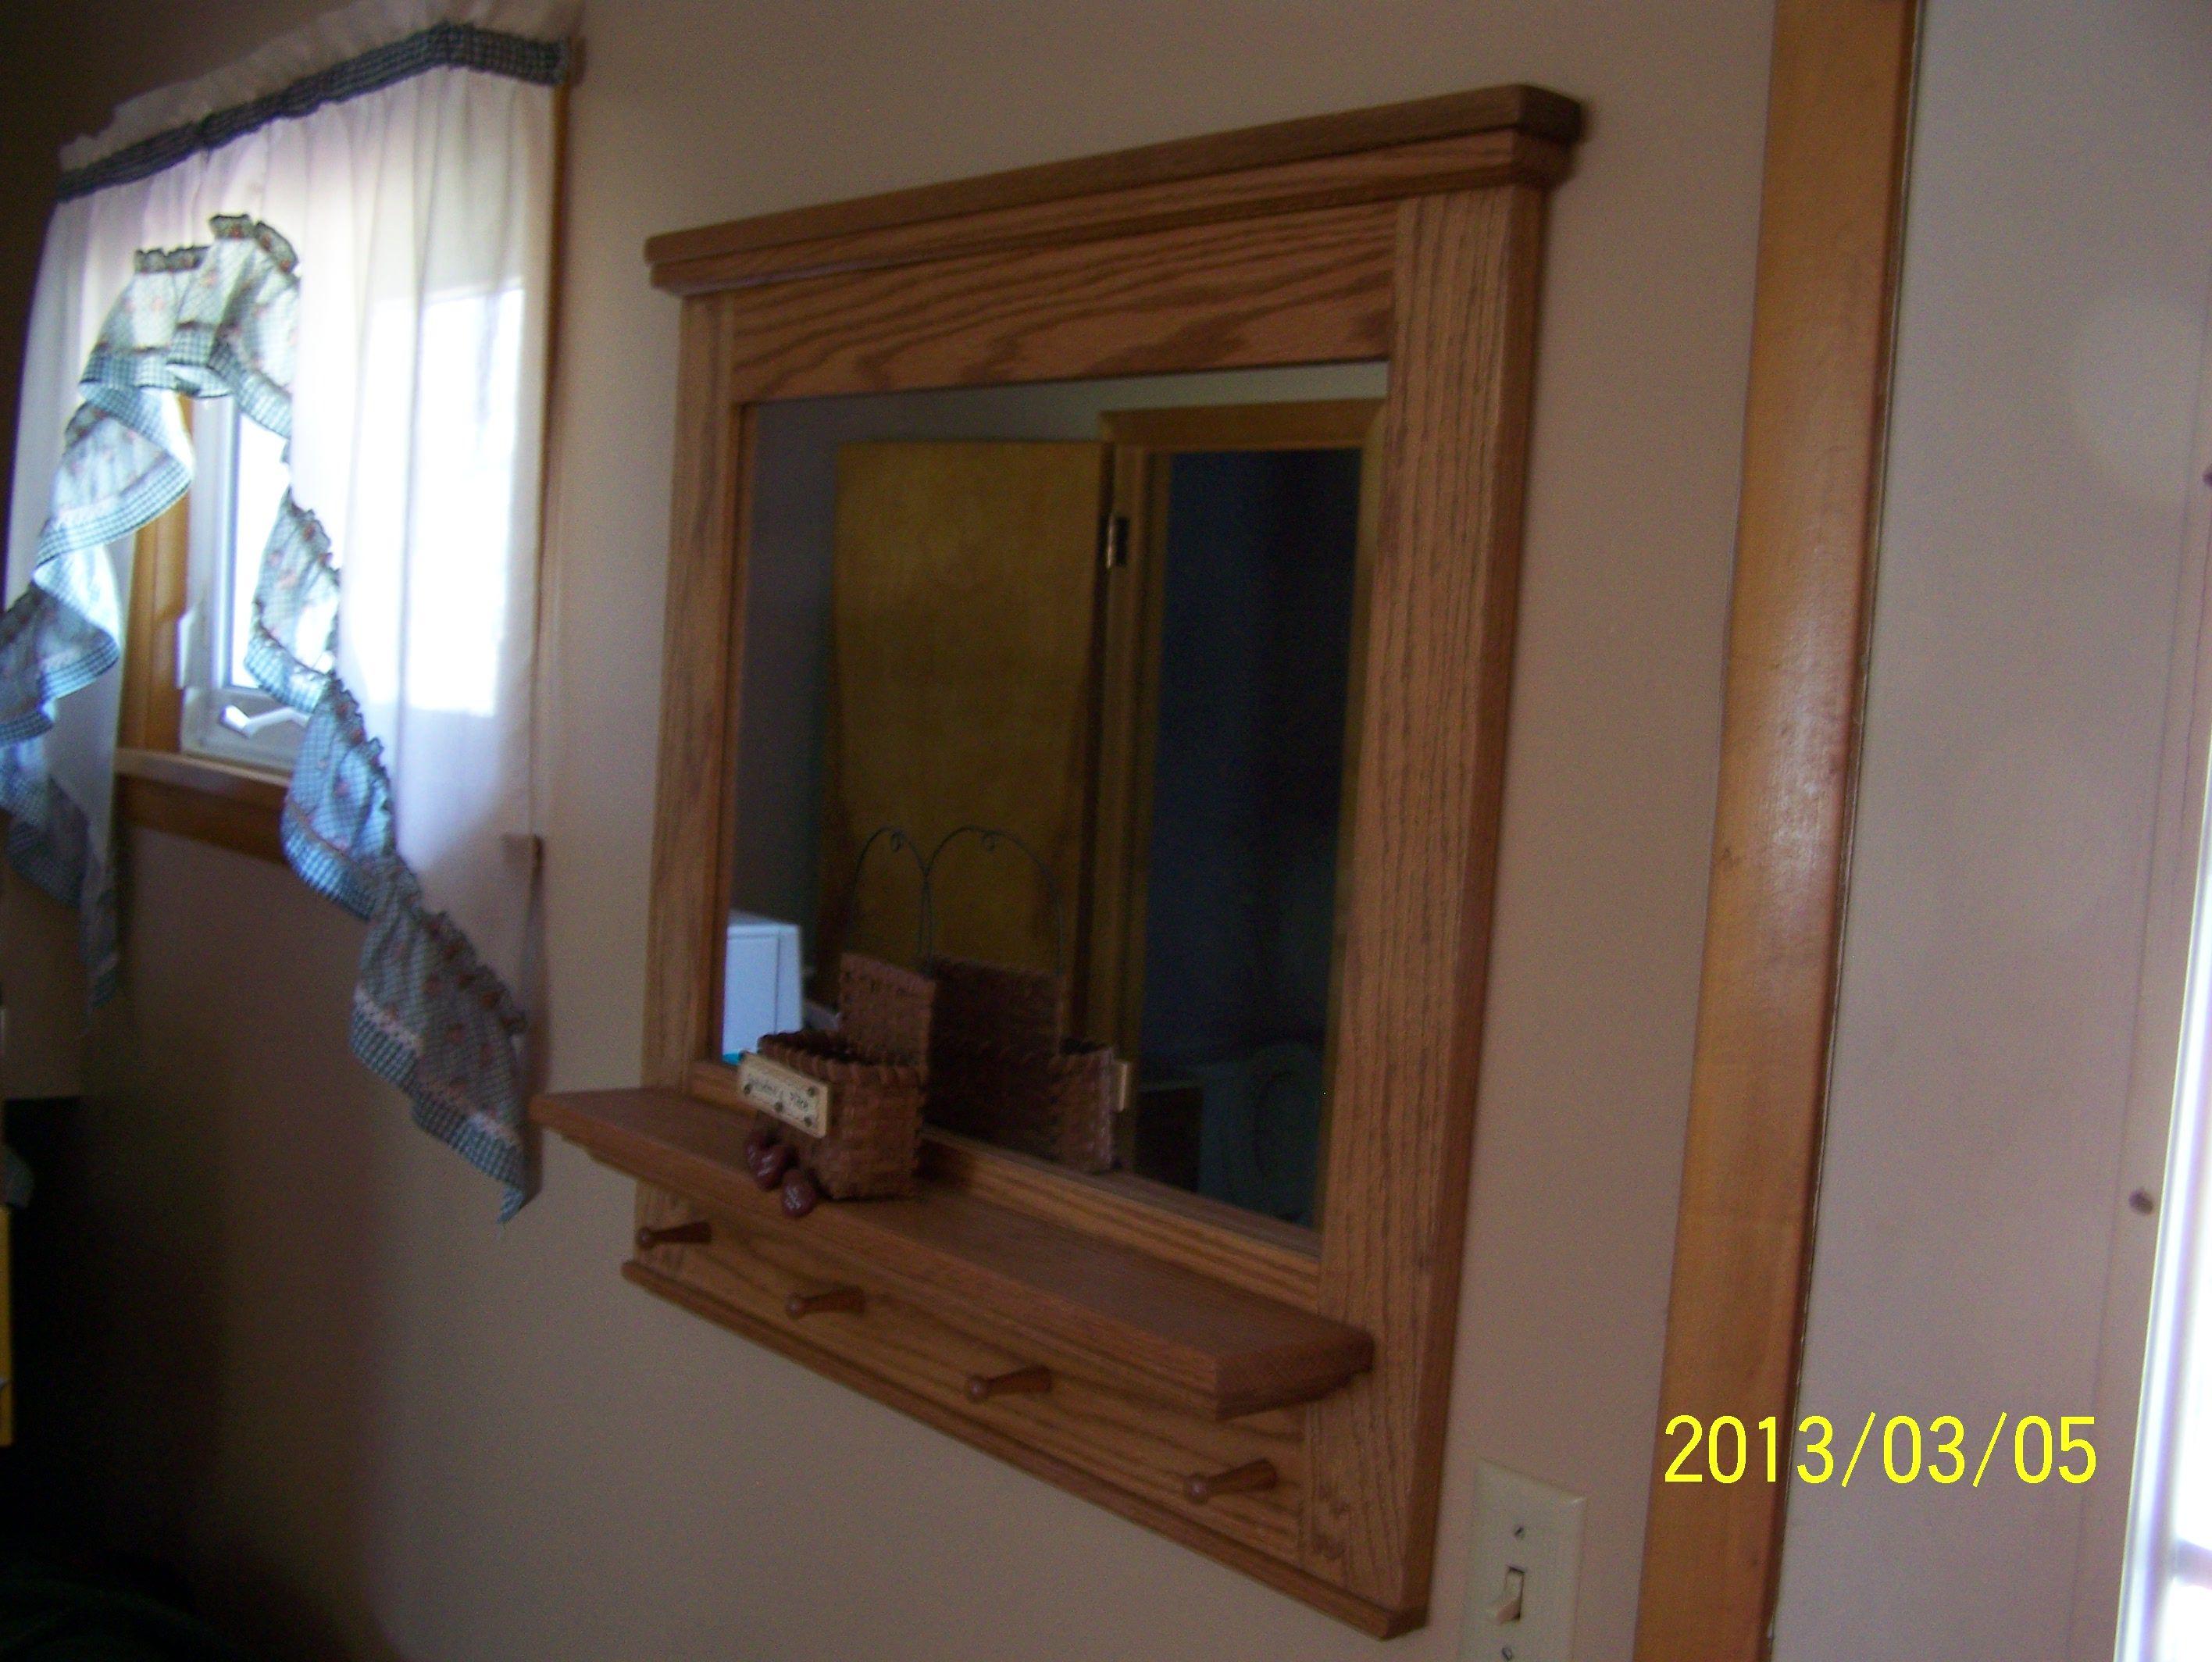 Baby cribs kijiji calgary - Hall Mirror I Built Woodworking Ideas Pinterest Rocking Chair Kijiji Calgary